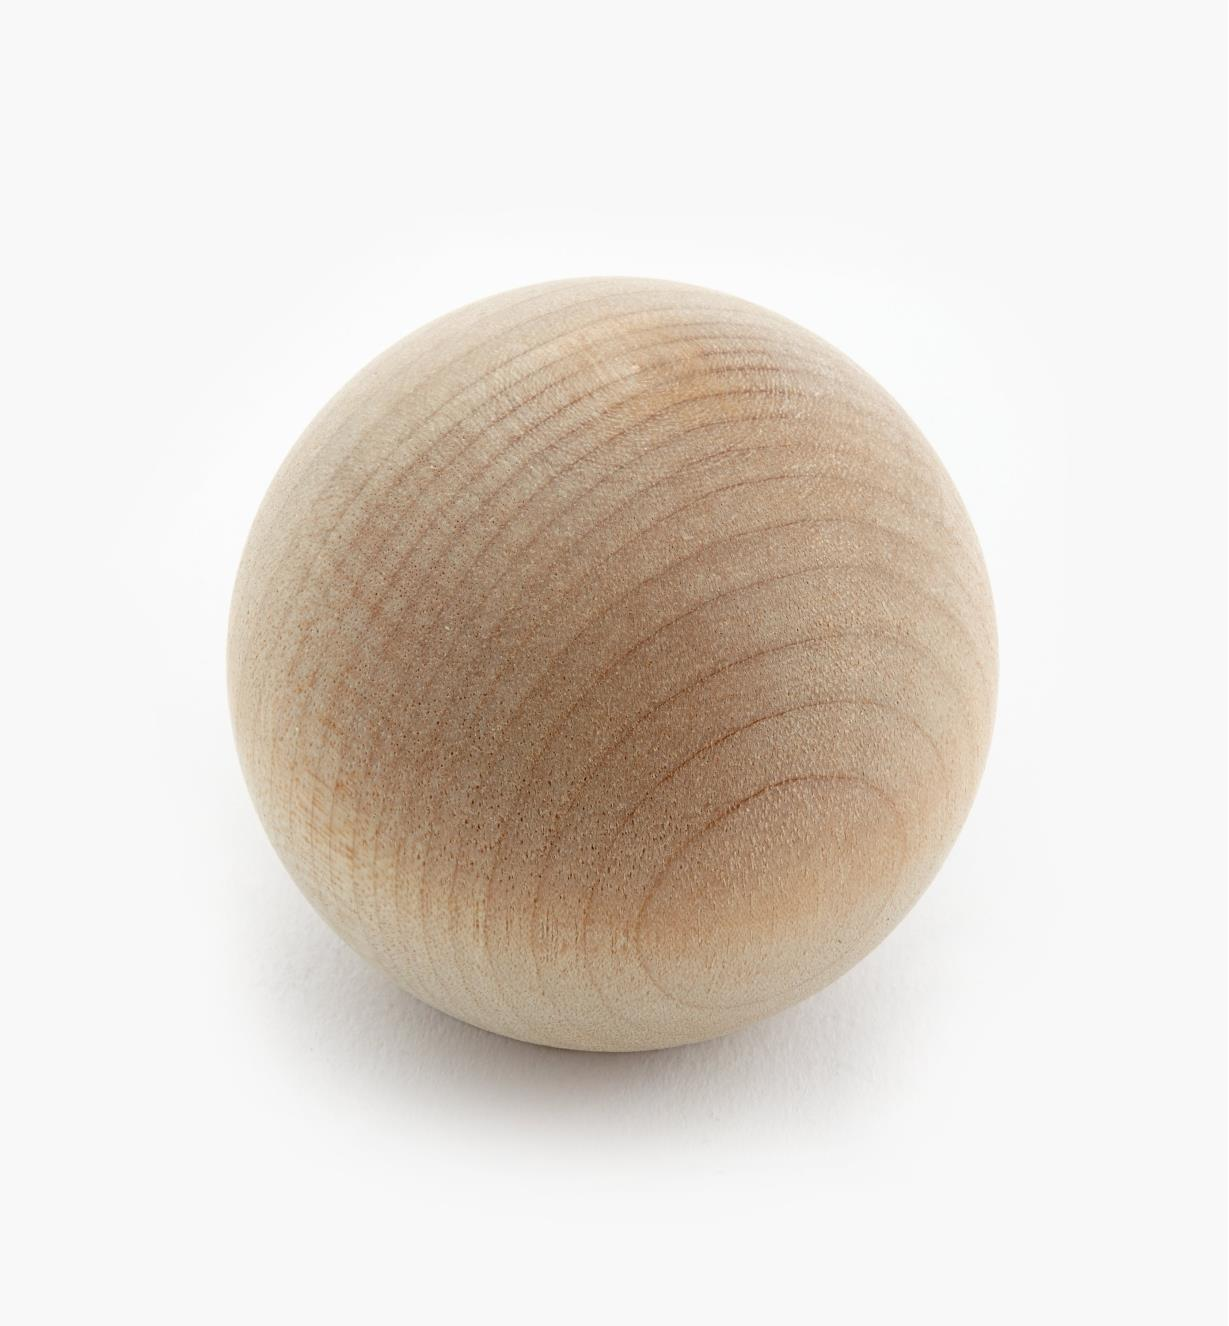 "41K2606 - 1 1/4"" dia. Ball"